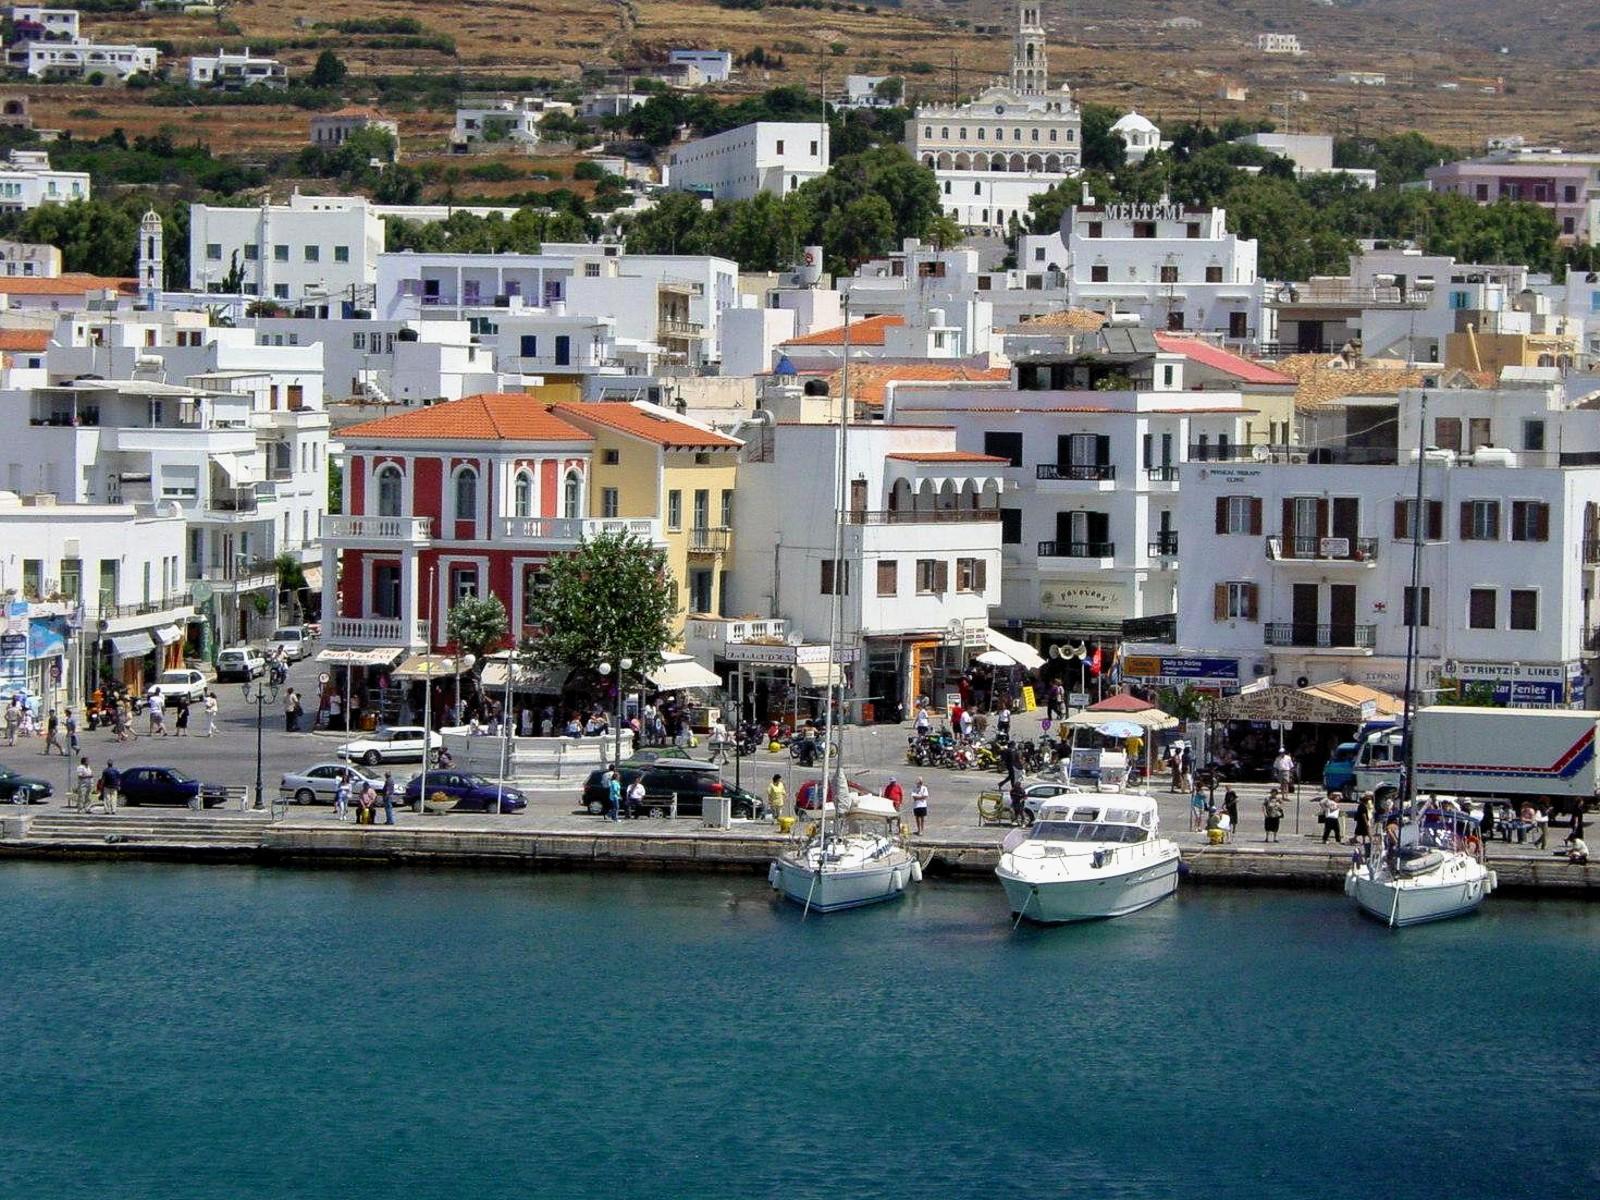 DOT_Greece_37_Tinos_56